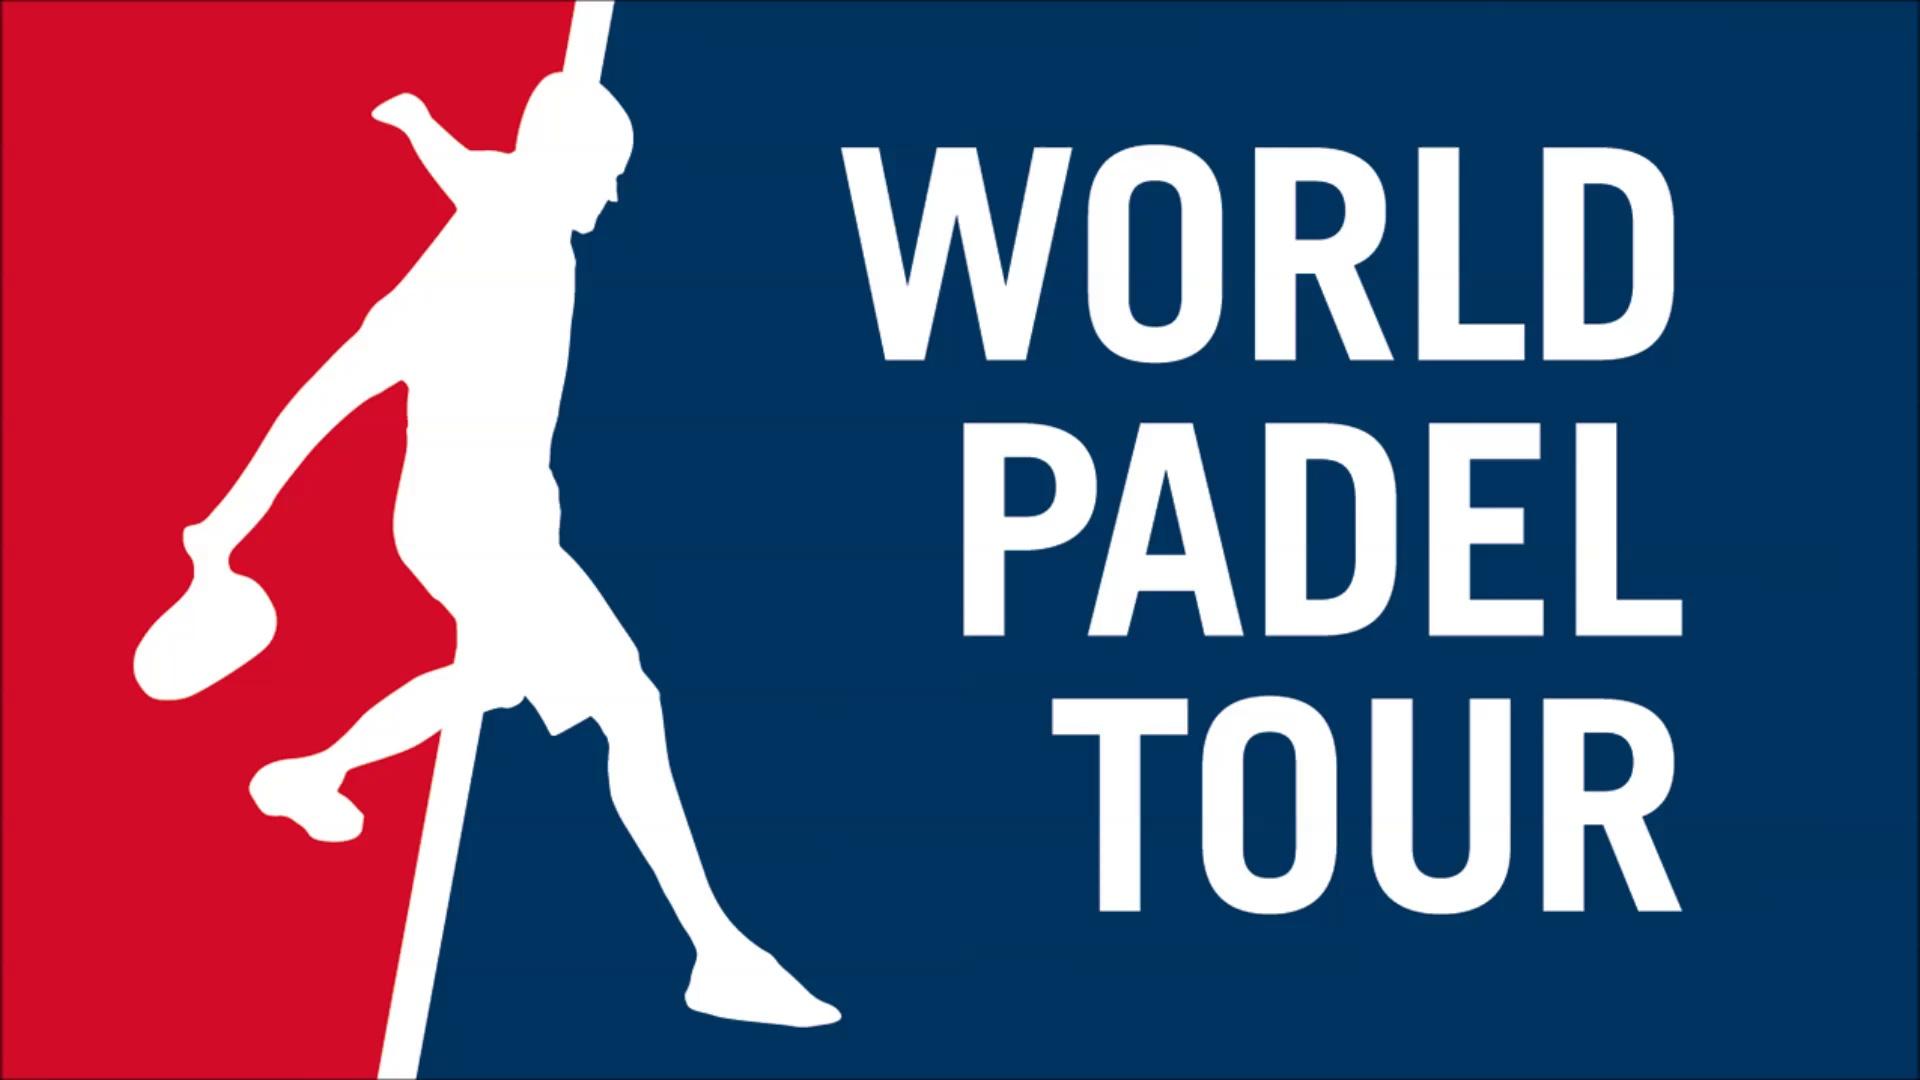 world padel tour